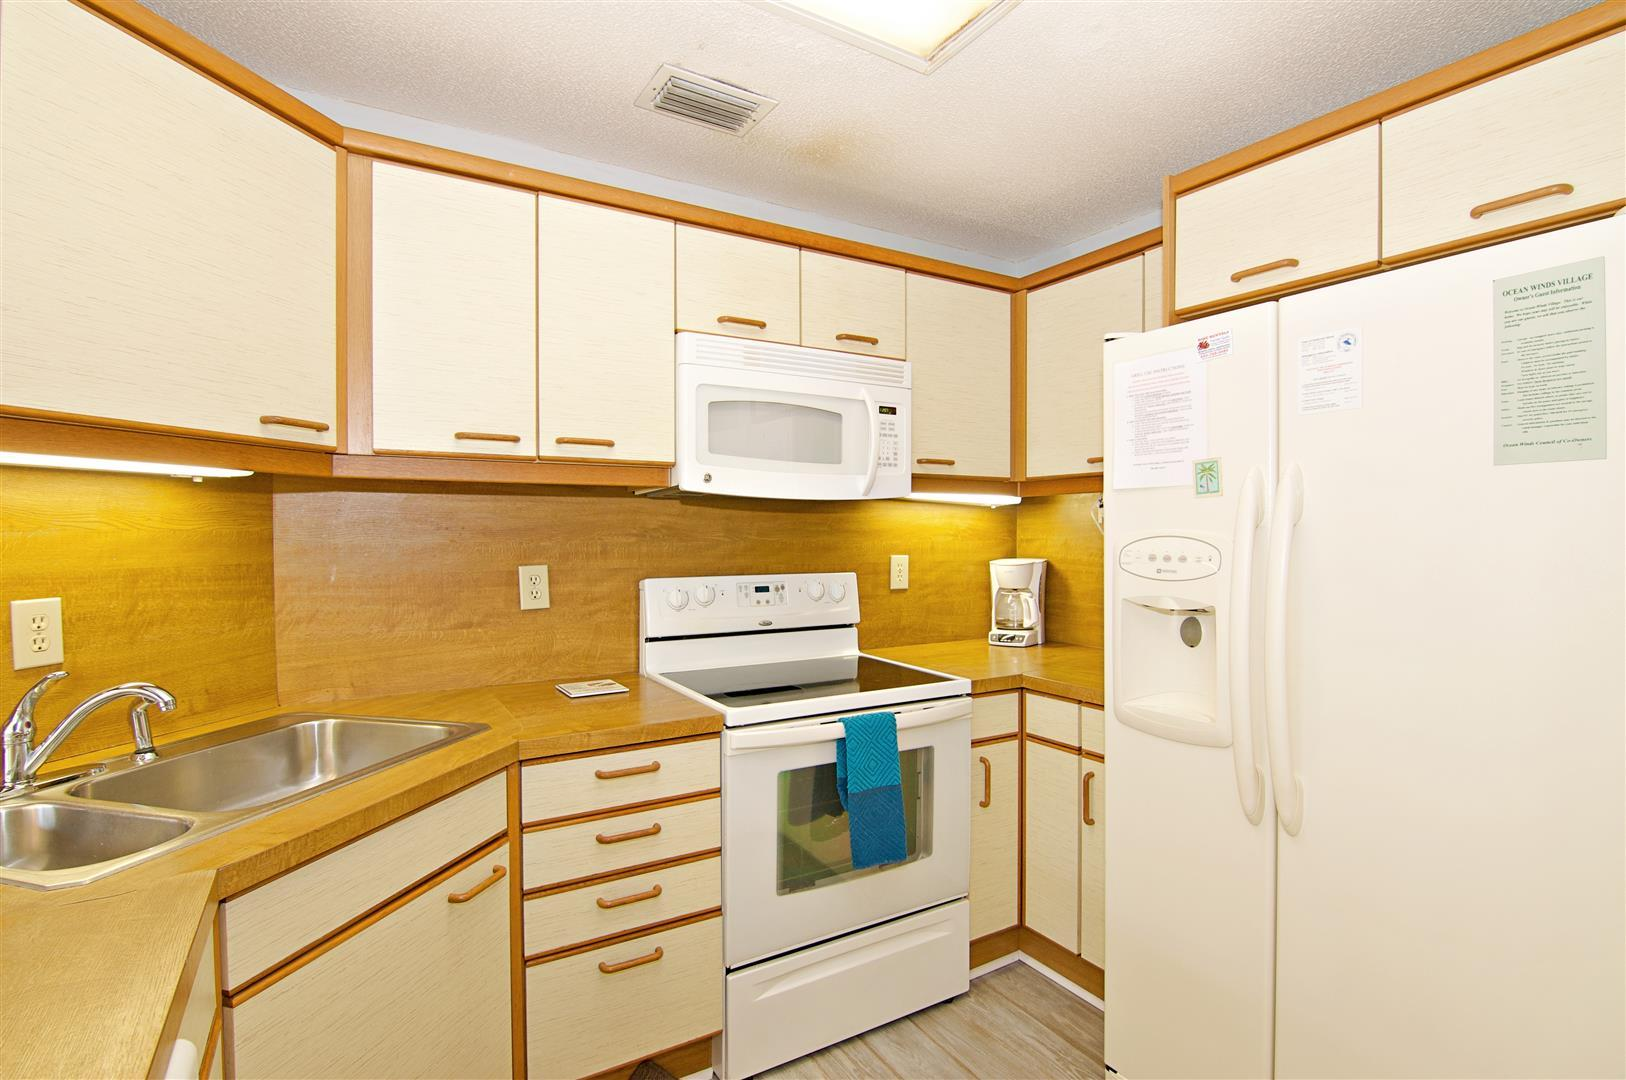 Seabrook Island Homes For Sale - 3020 Ocean Winds, Seabrook Island, SC - 40